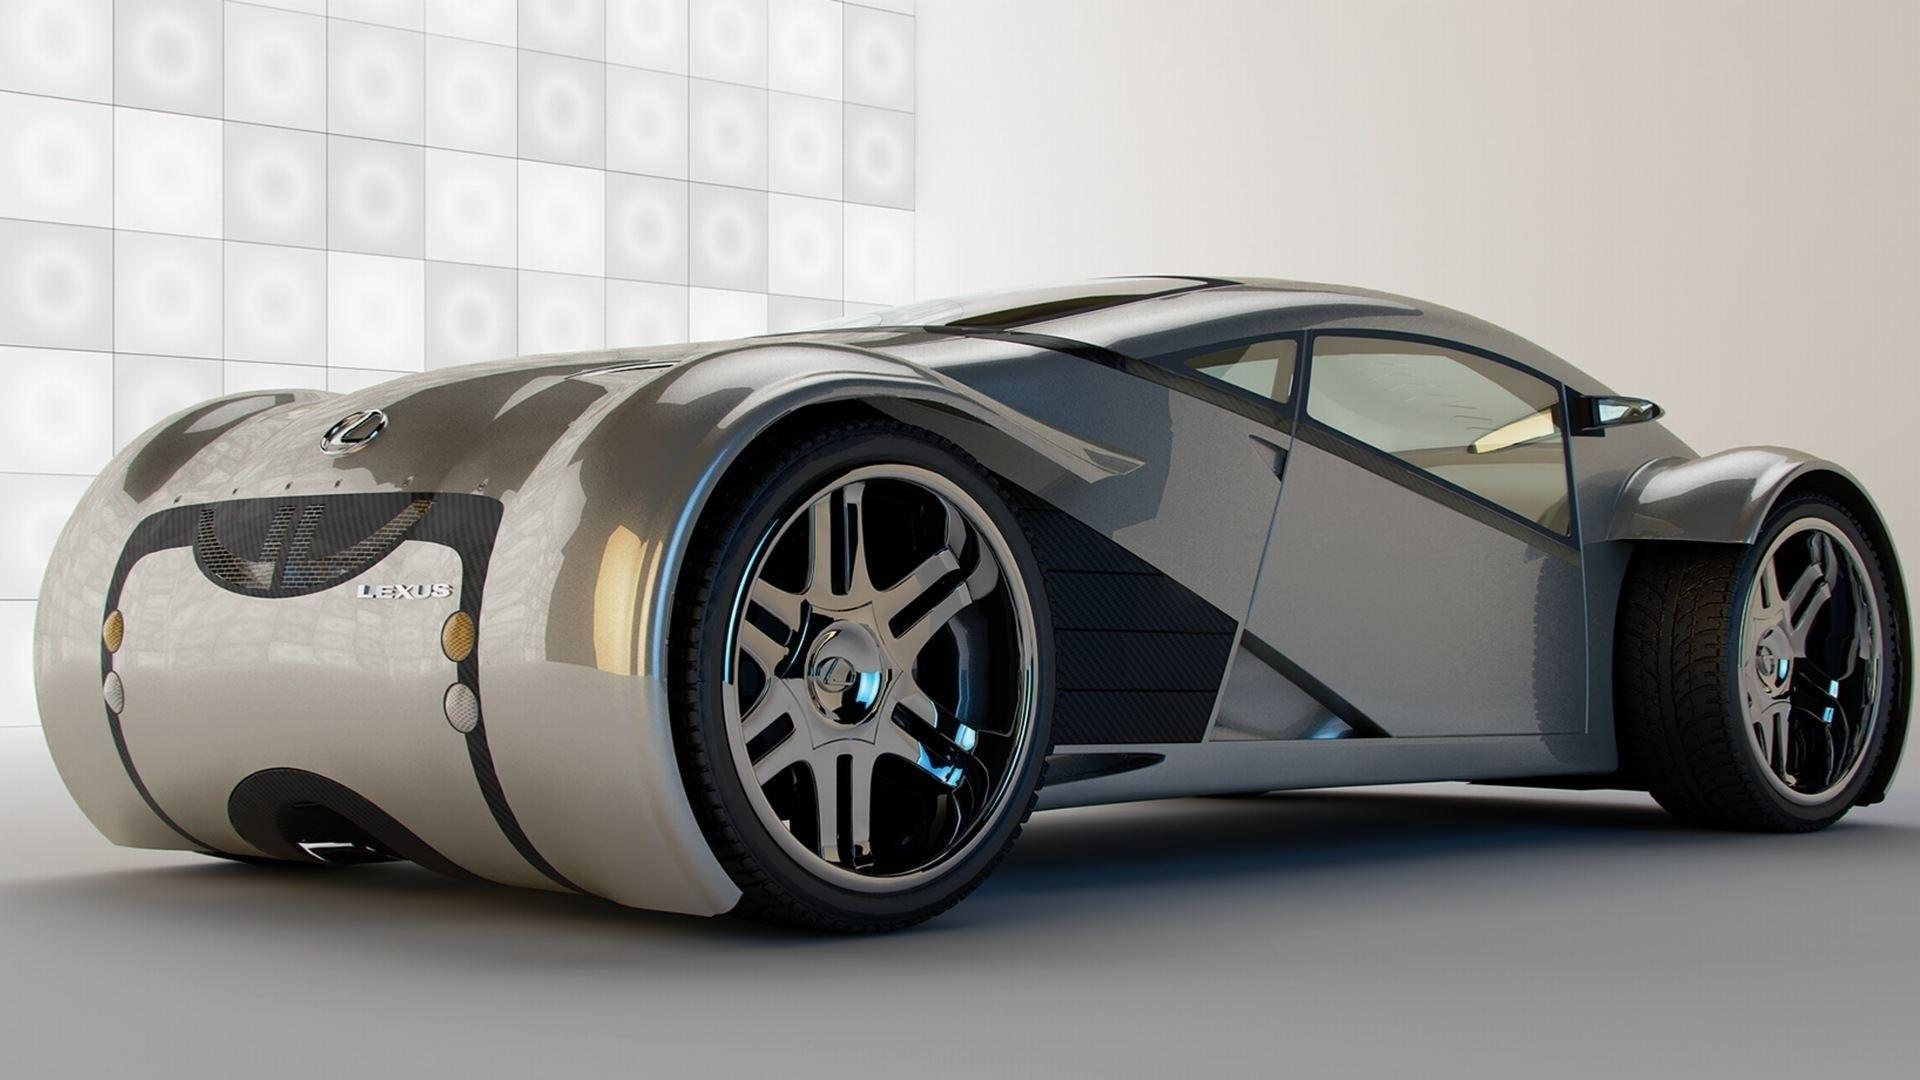 Download Wallpaper 1920x1080 Lexus New Model Sports Car Full Hd 1080p Hd Background